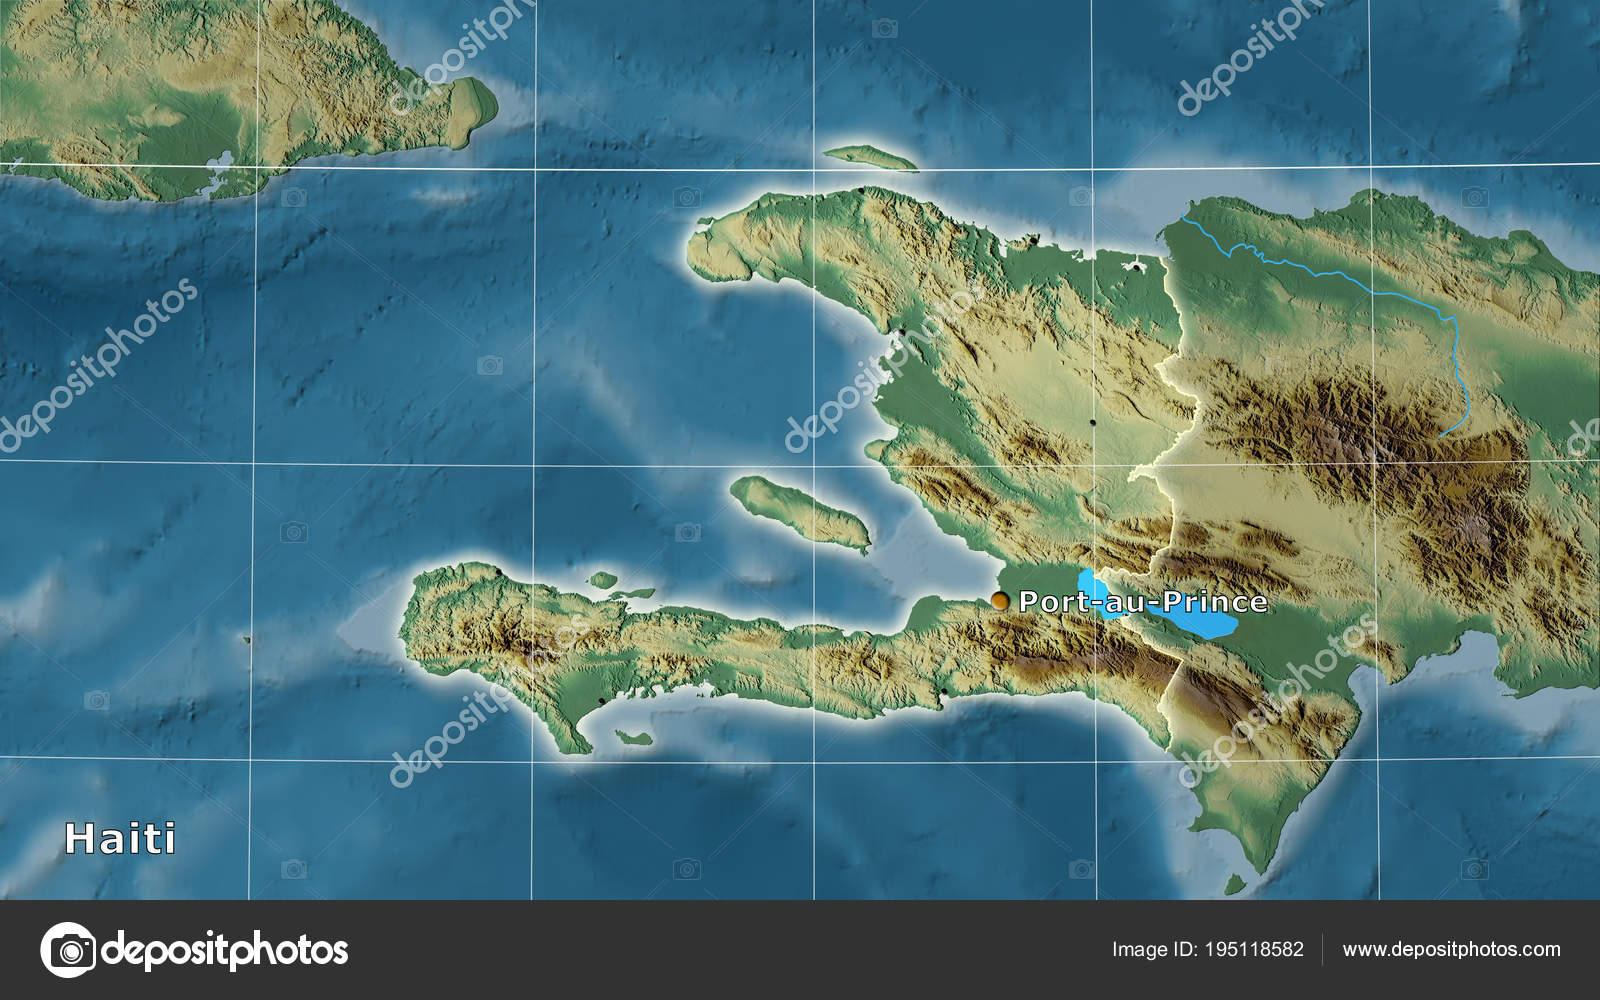 Topographic Map Of Haiti.Haiti Topographic Relief Composition Stock Photo C Yarr65